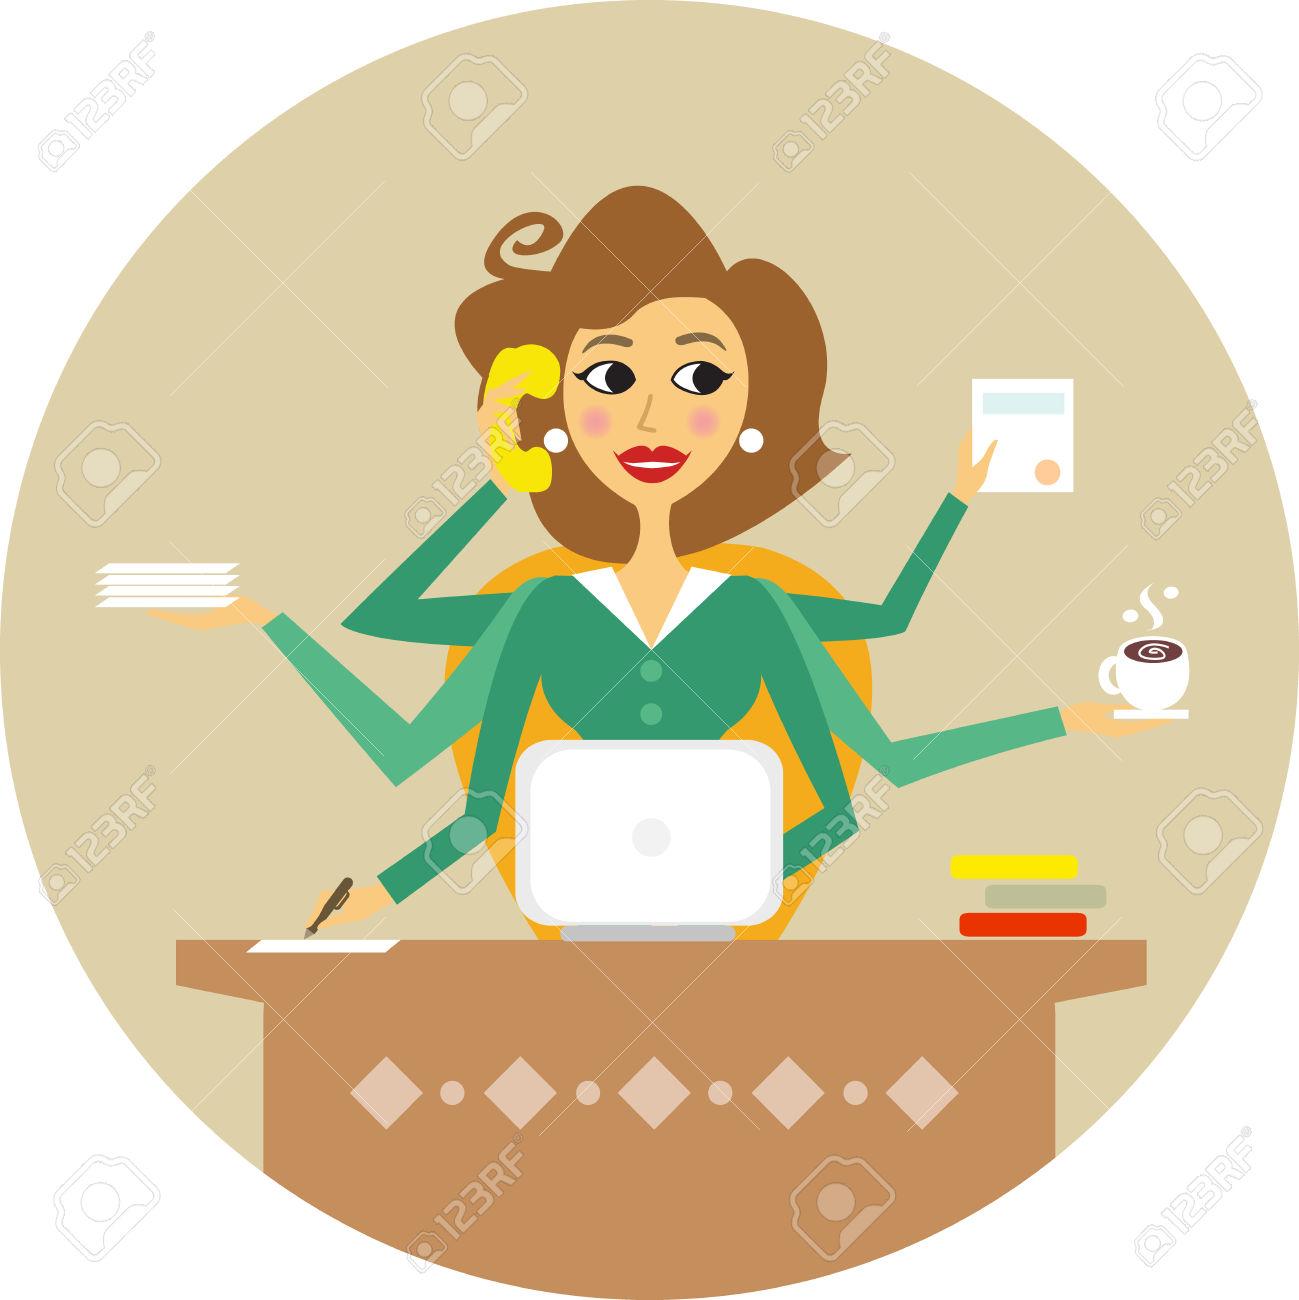 22952271-personal-assistant-or-hard-working-secretary-symbol-vector-illustration-stock-photo.jpg